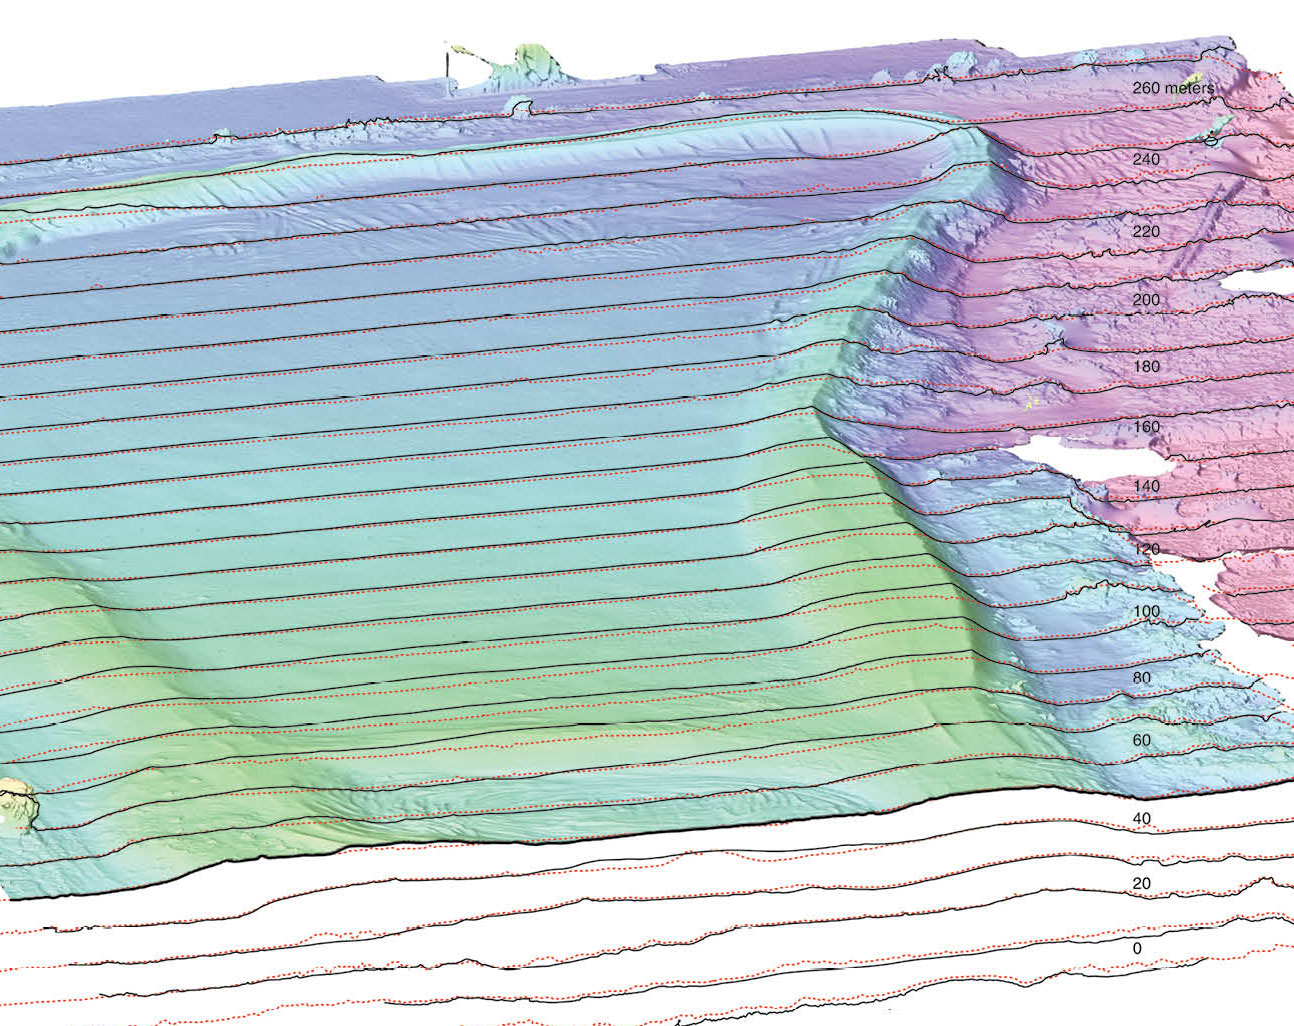 3D Terrain of Antioch Dunes National Wildlife Refuge. Image by Brett Milligan